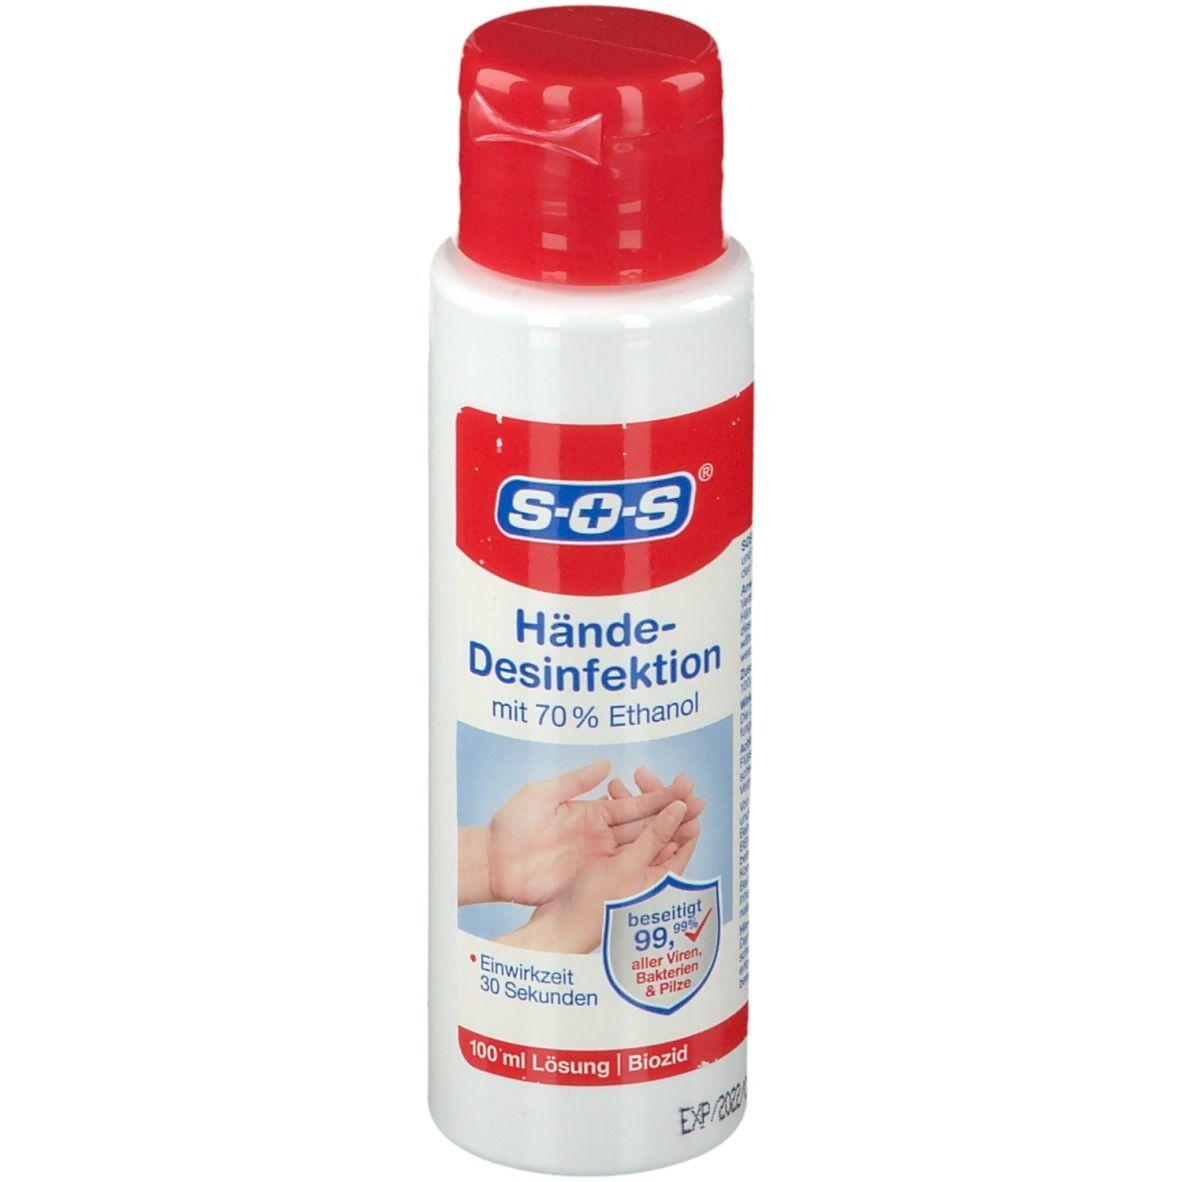 SOS® Hände-Desinfektionslösung